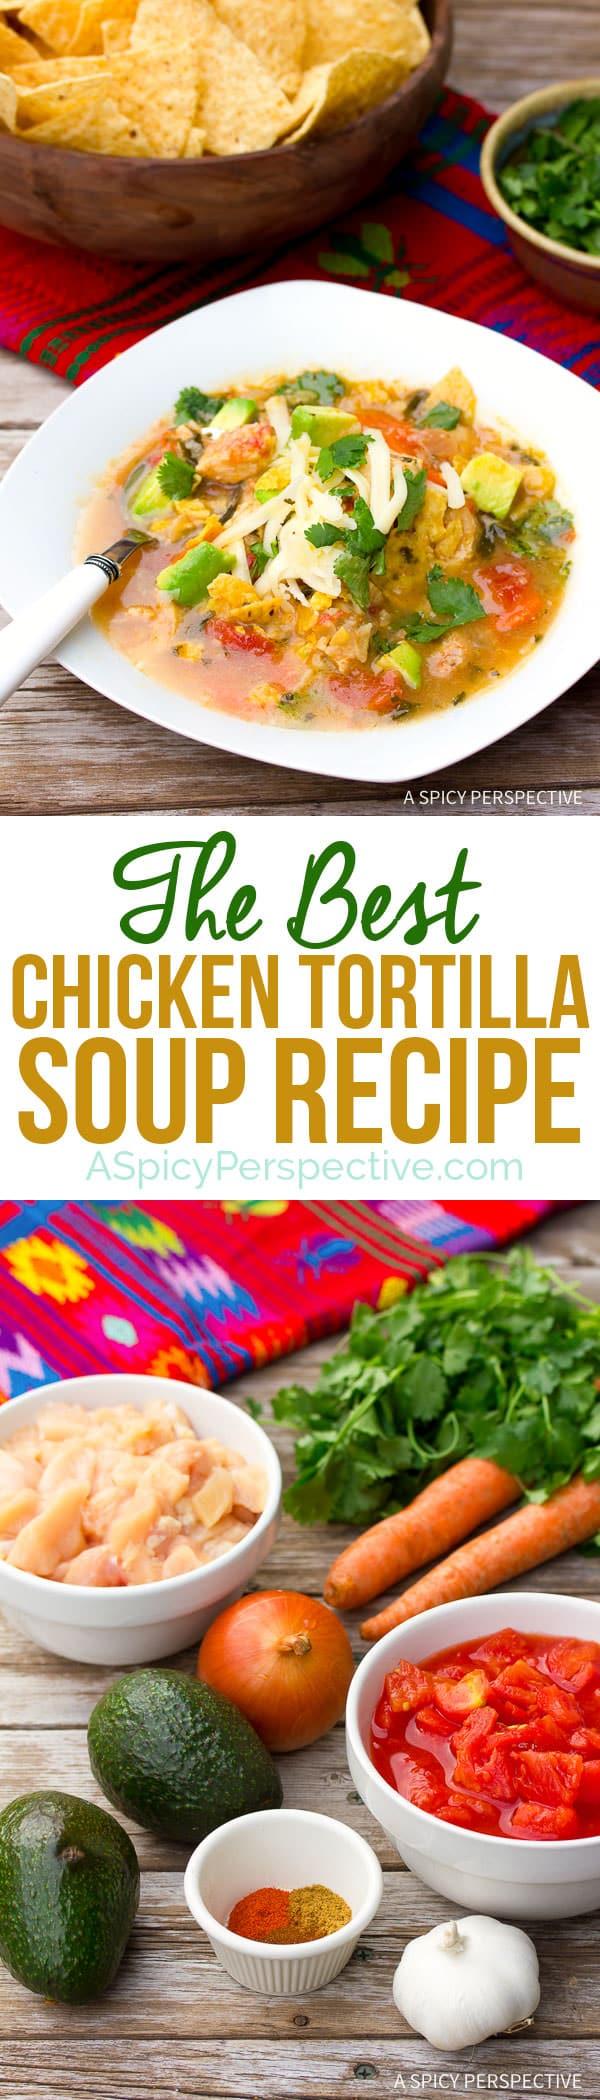 The Best Ever Chicken Tortilla Soup Recipe on ASpicyPerspective.com